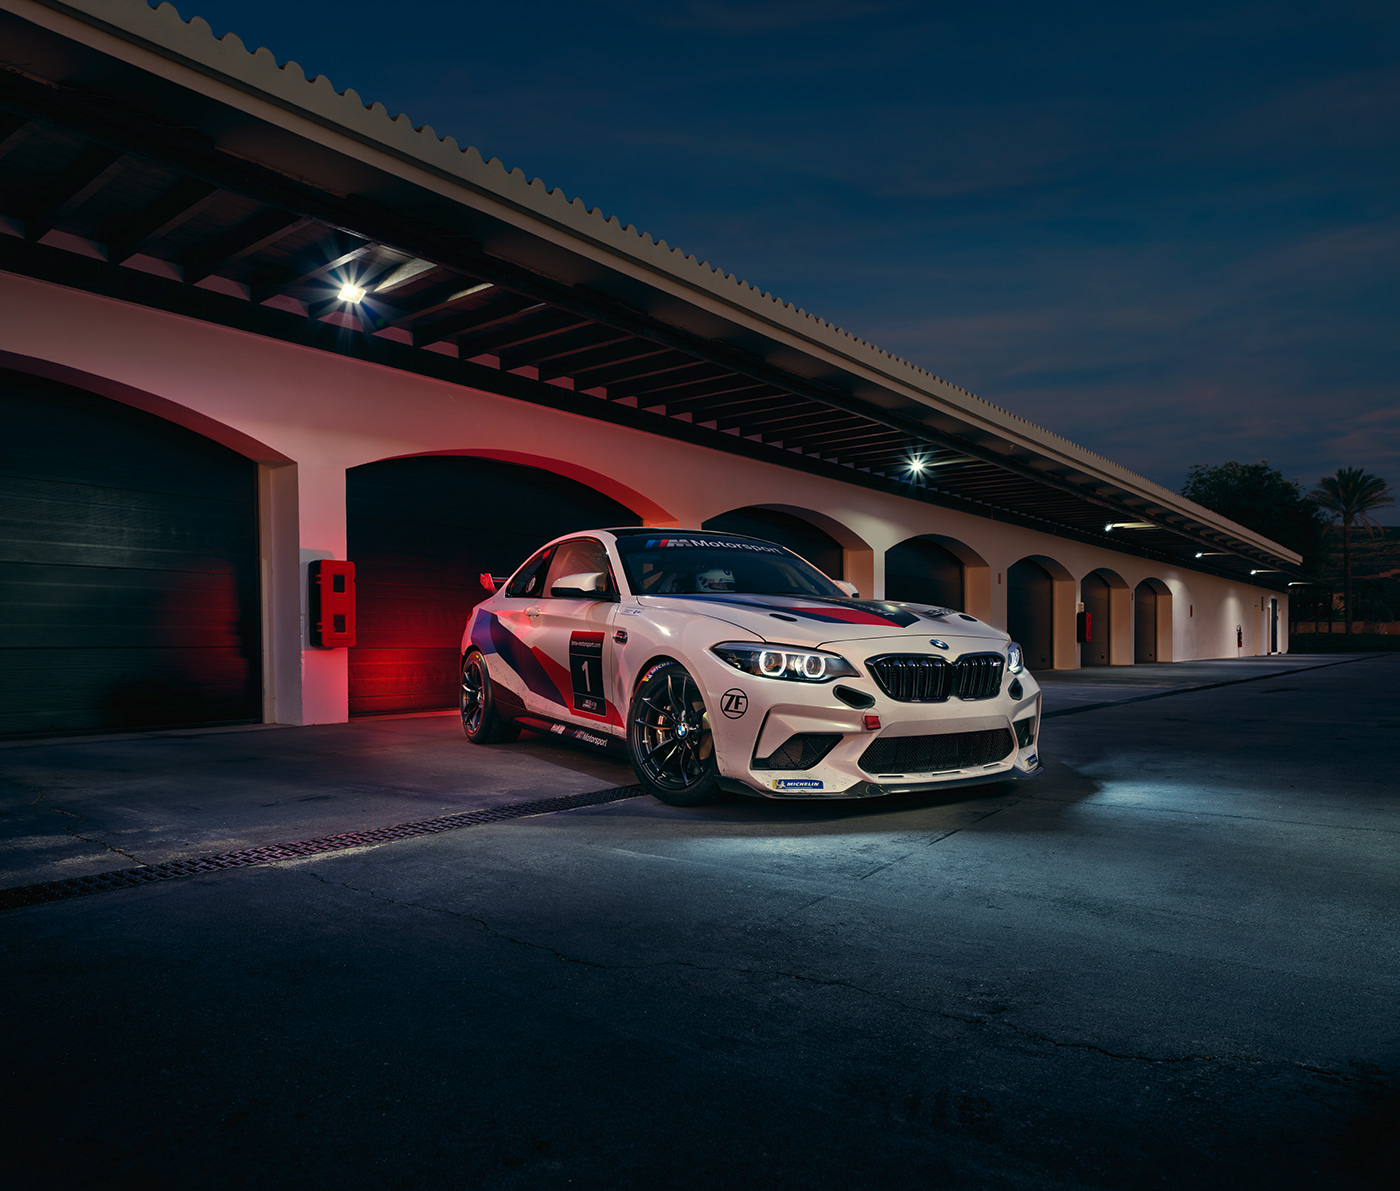 BMW M2 CS And M2 CS Racing Campaign For BMW And Havas. On